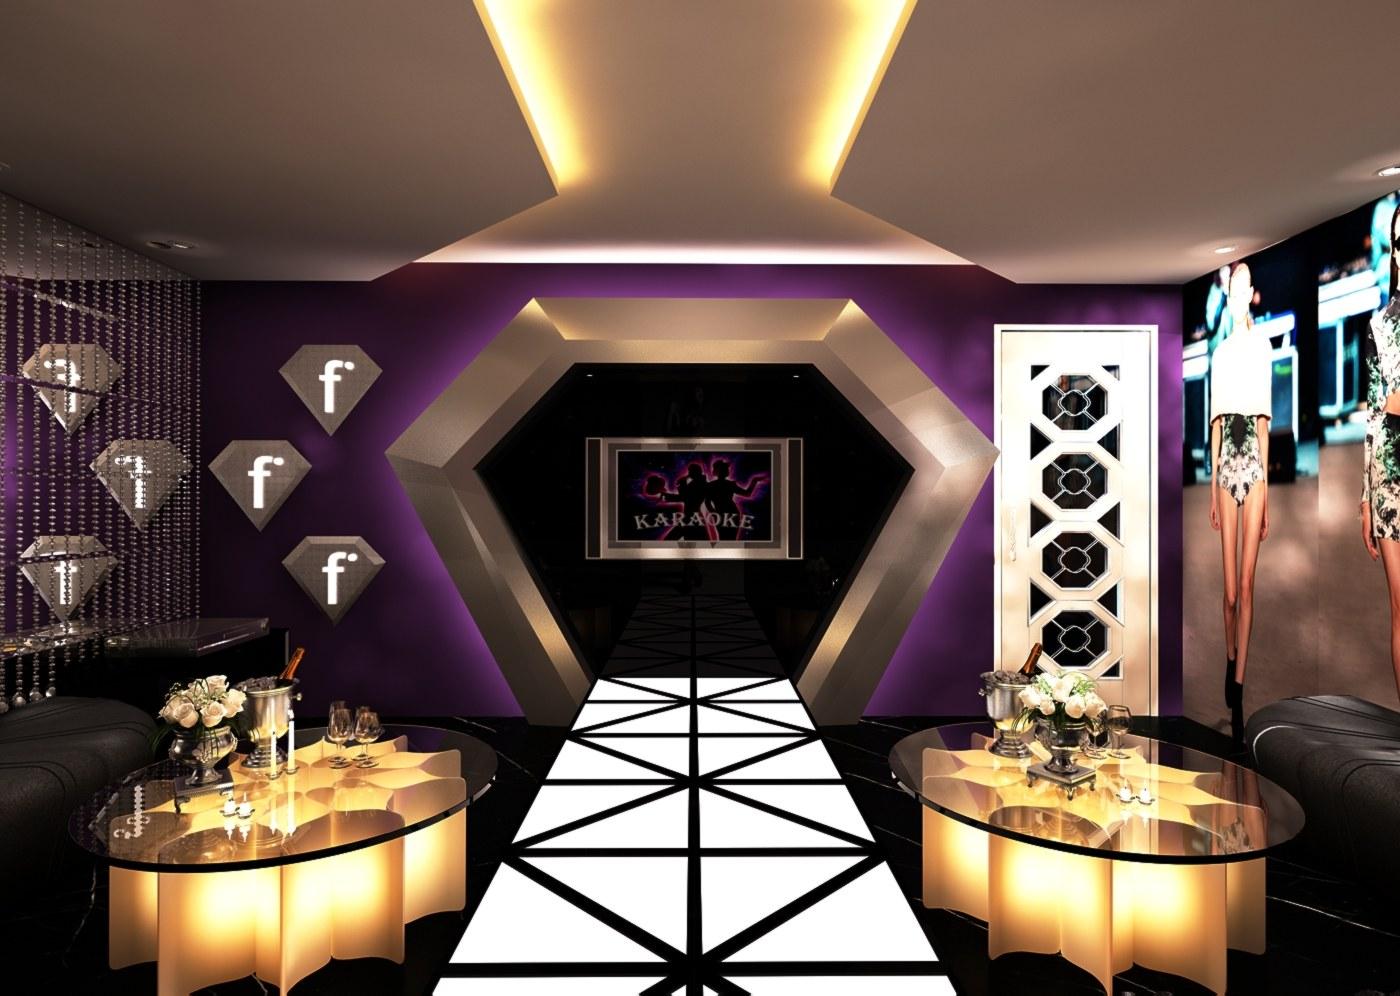 thiet-ke-trang-tri-phong-karaoke-3